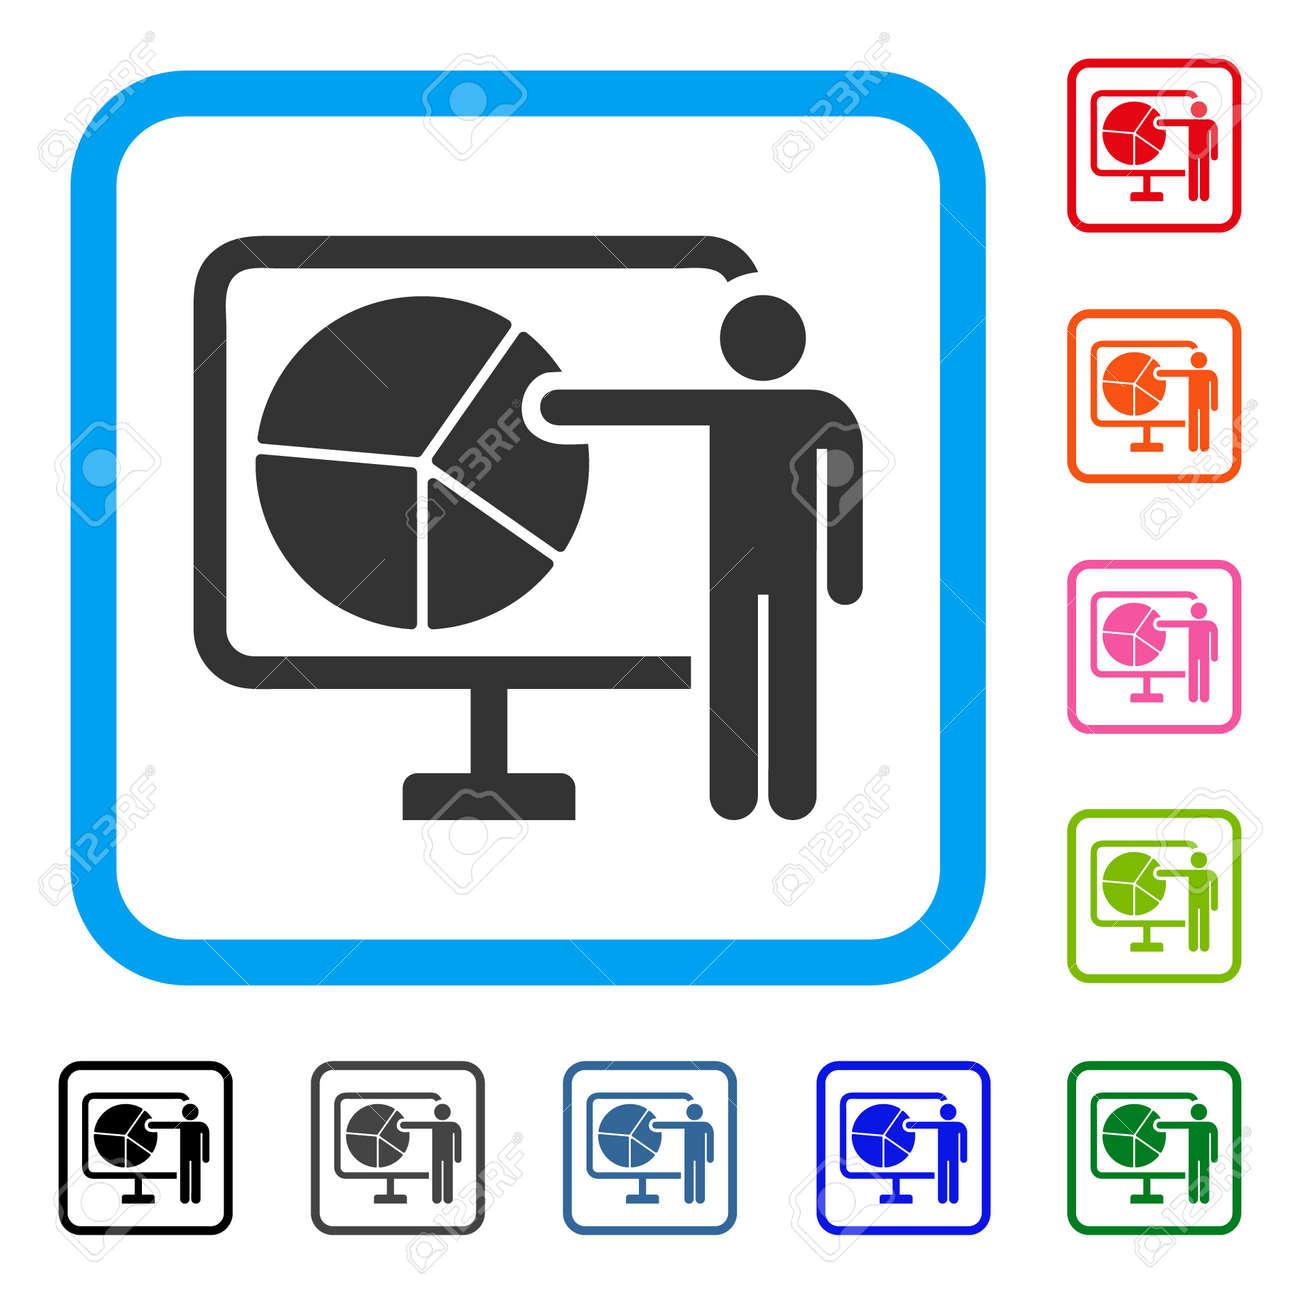 pie chart public report icon flat gray iconic symbol inside